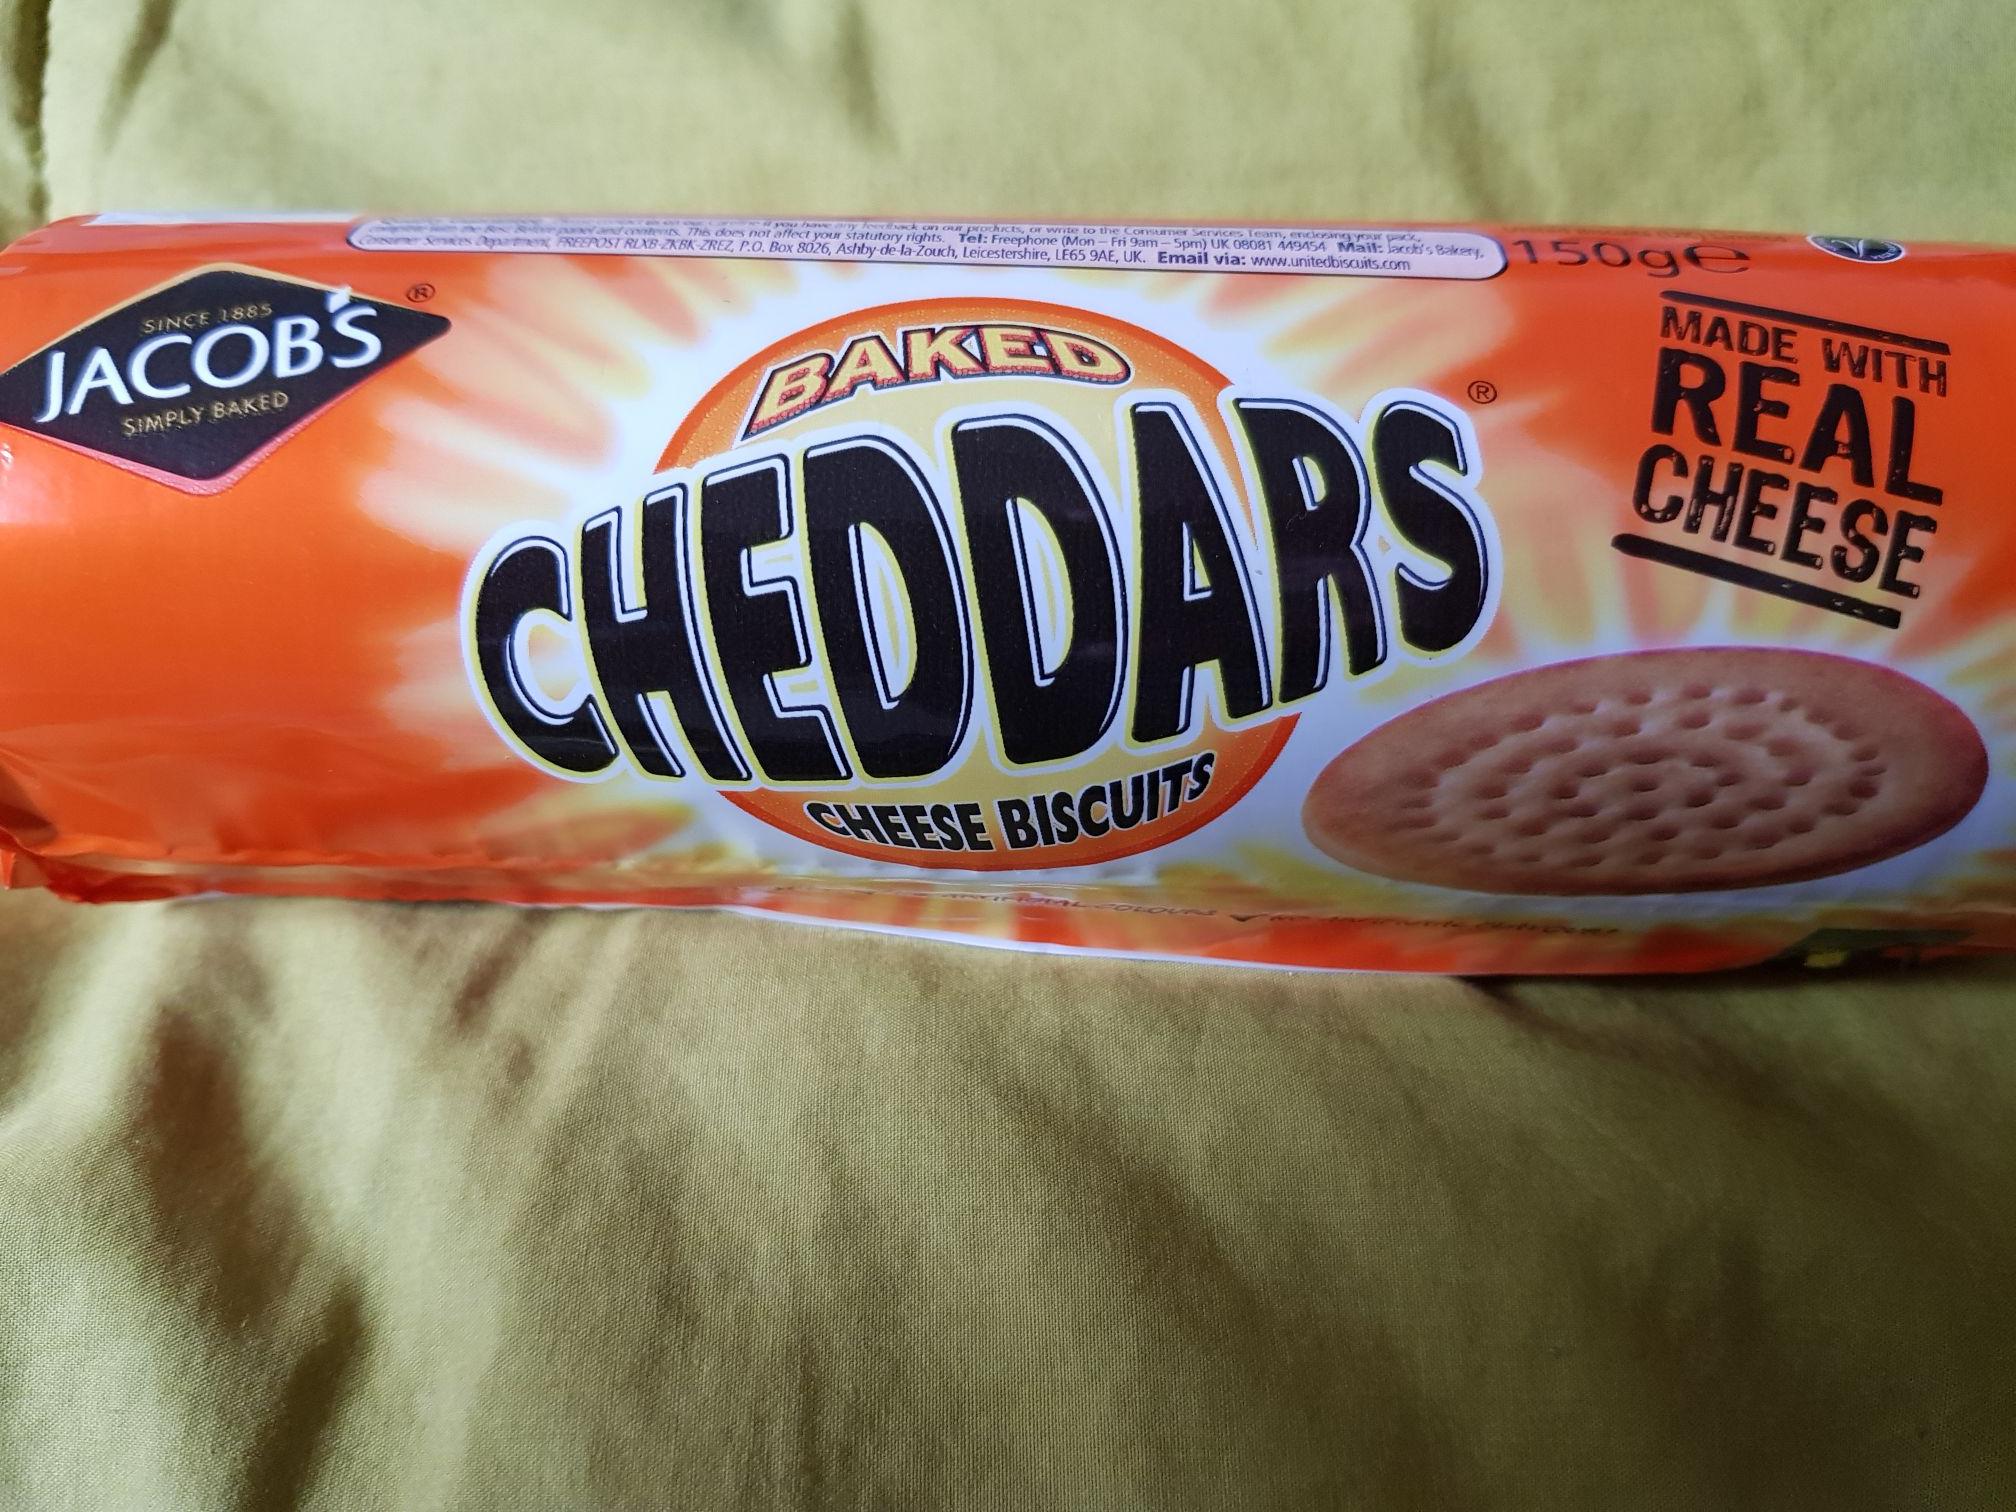 Cheddars half price (62p) instore at Sainsburys